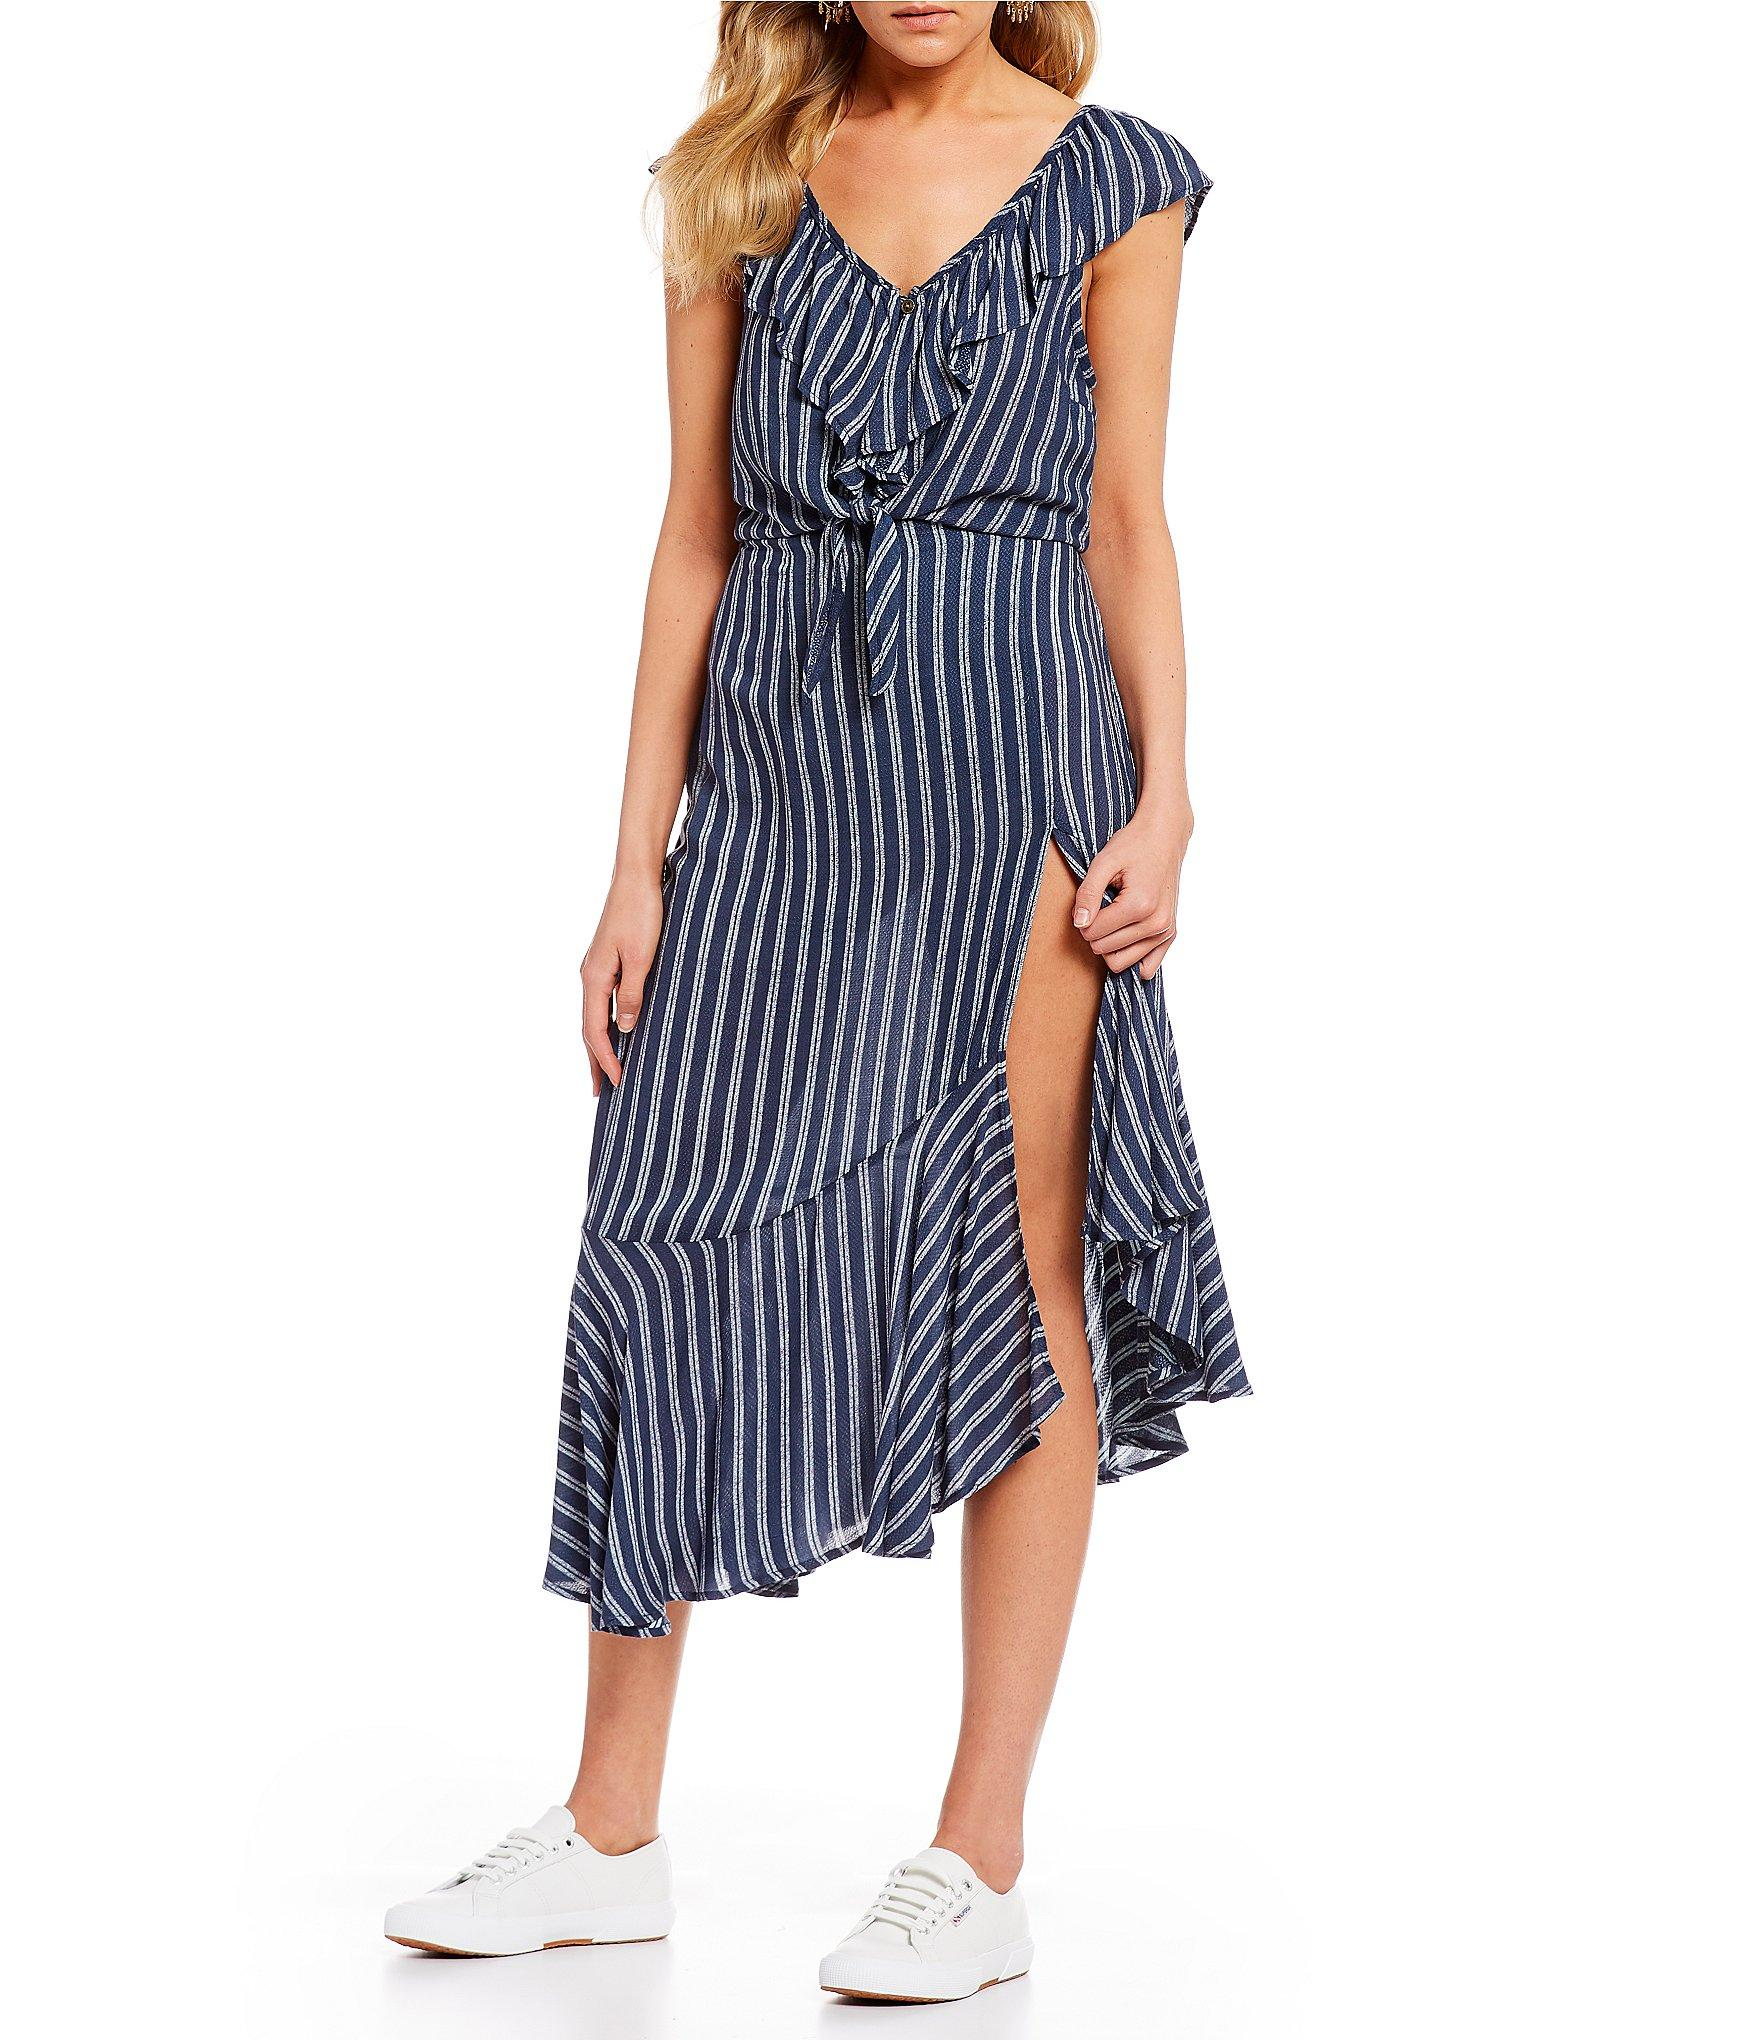 fa1338207 Jolt - Blue Stripe Asymmetrical Hem Skirt - Lyst. View fullscreen